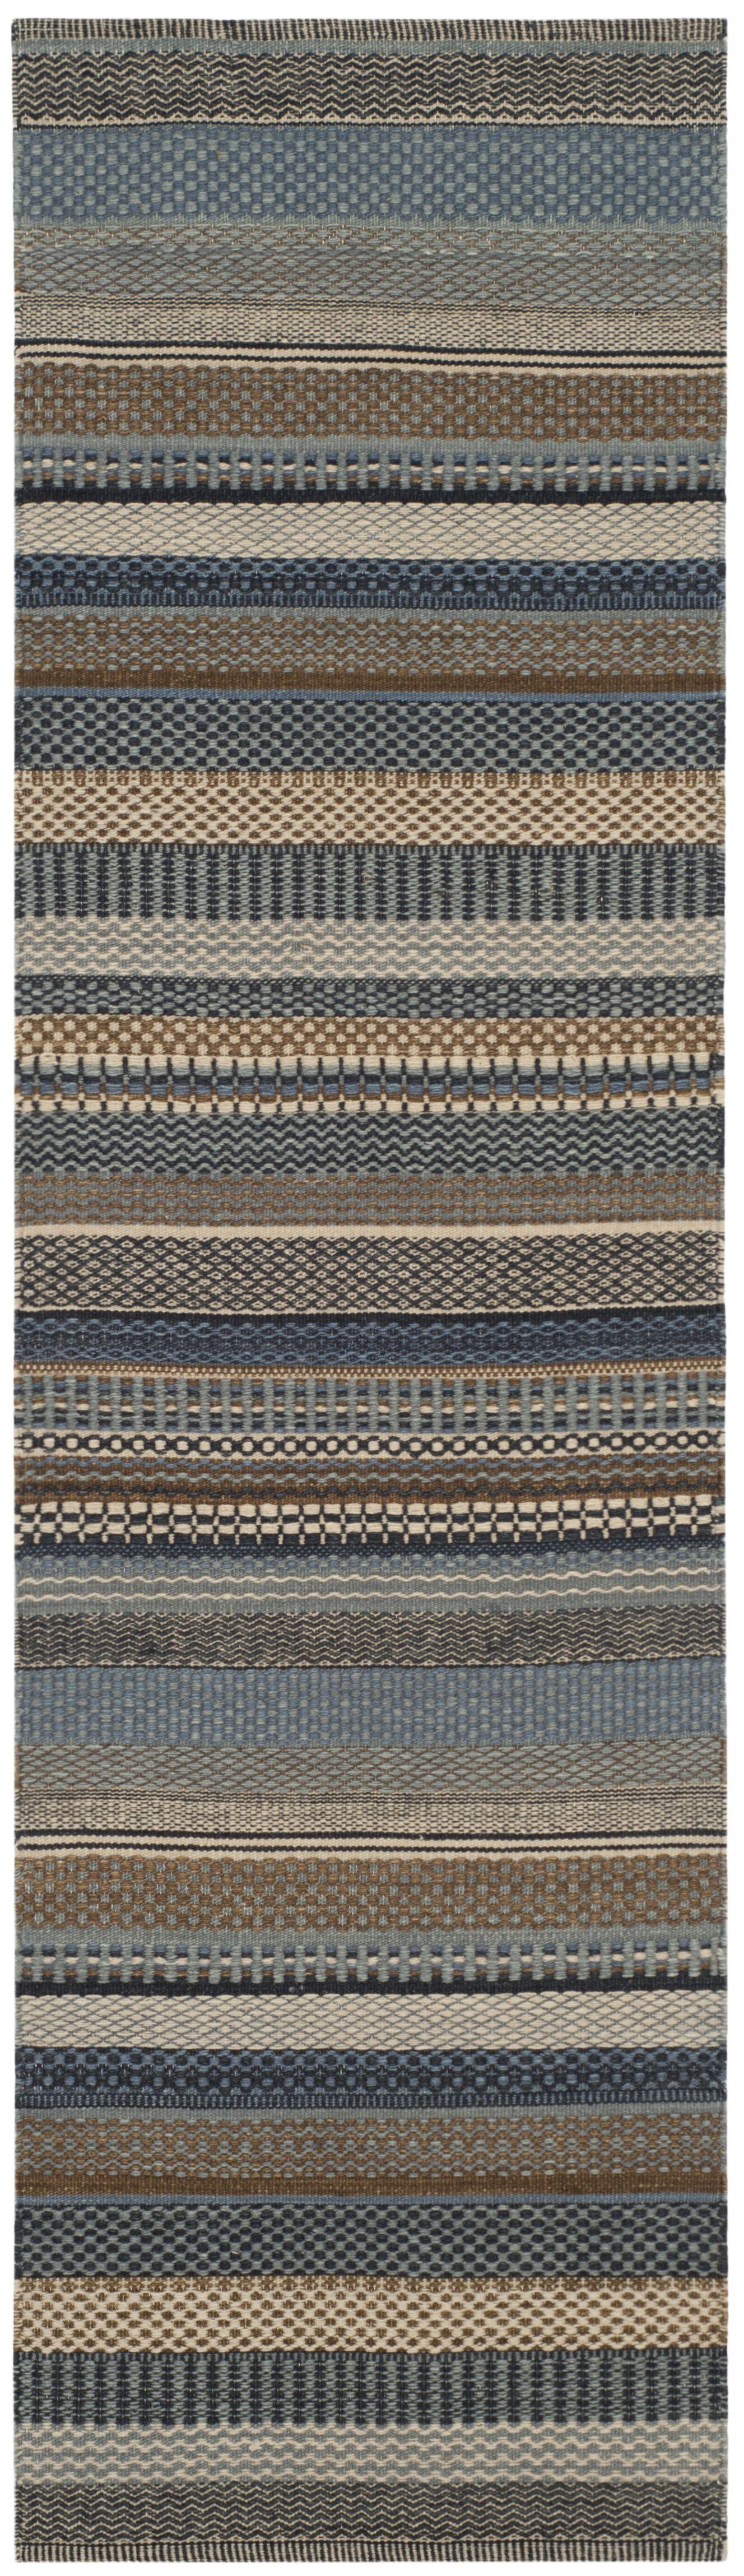 Kilim Hand-Tufted Wool Blue Area Rug Rug Size: Rectangle 3' x 5'